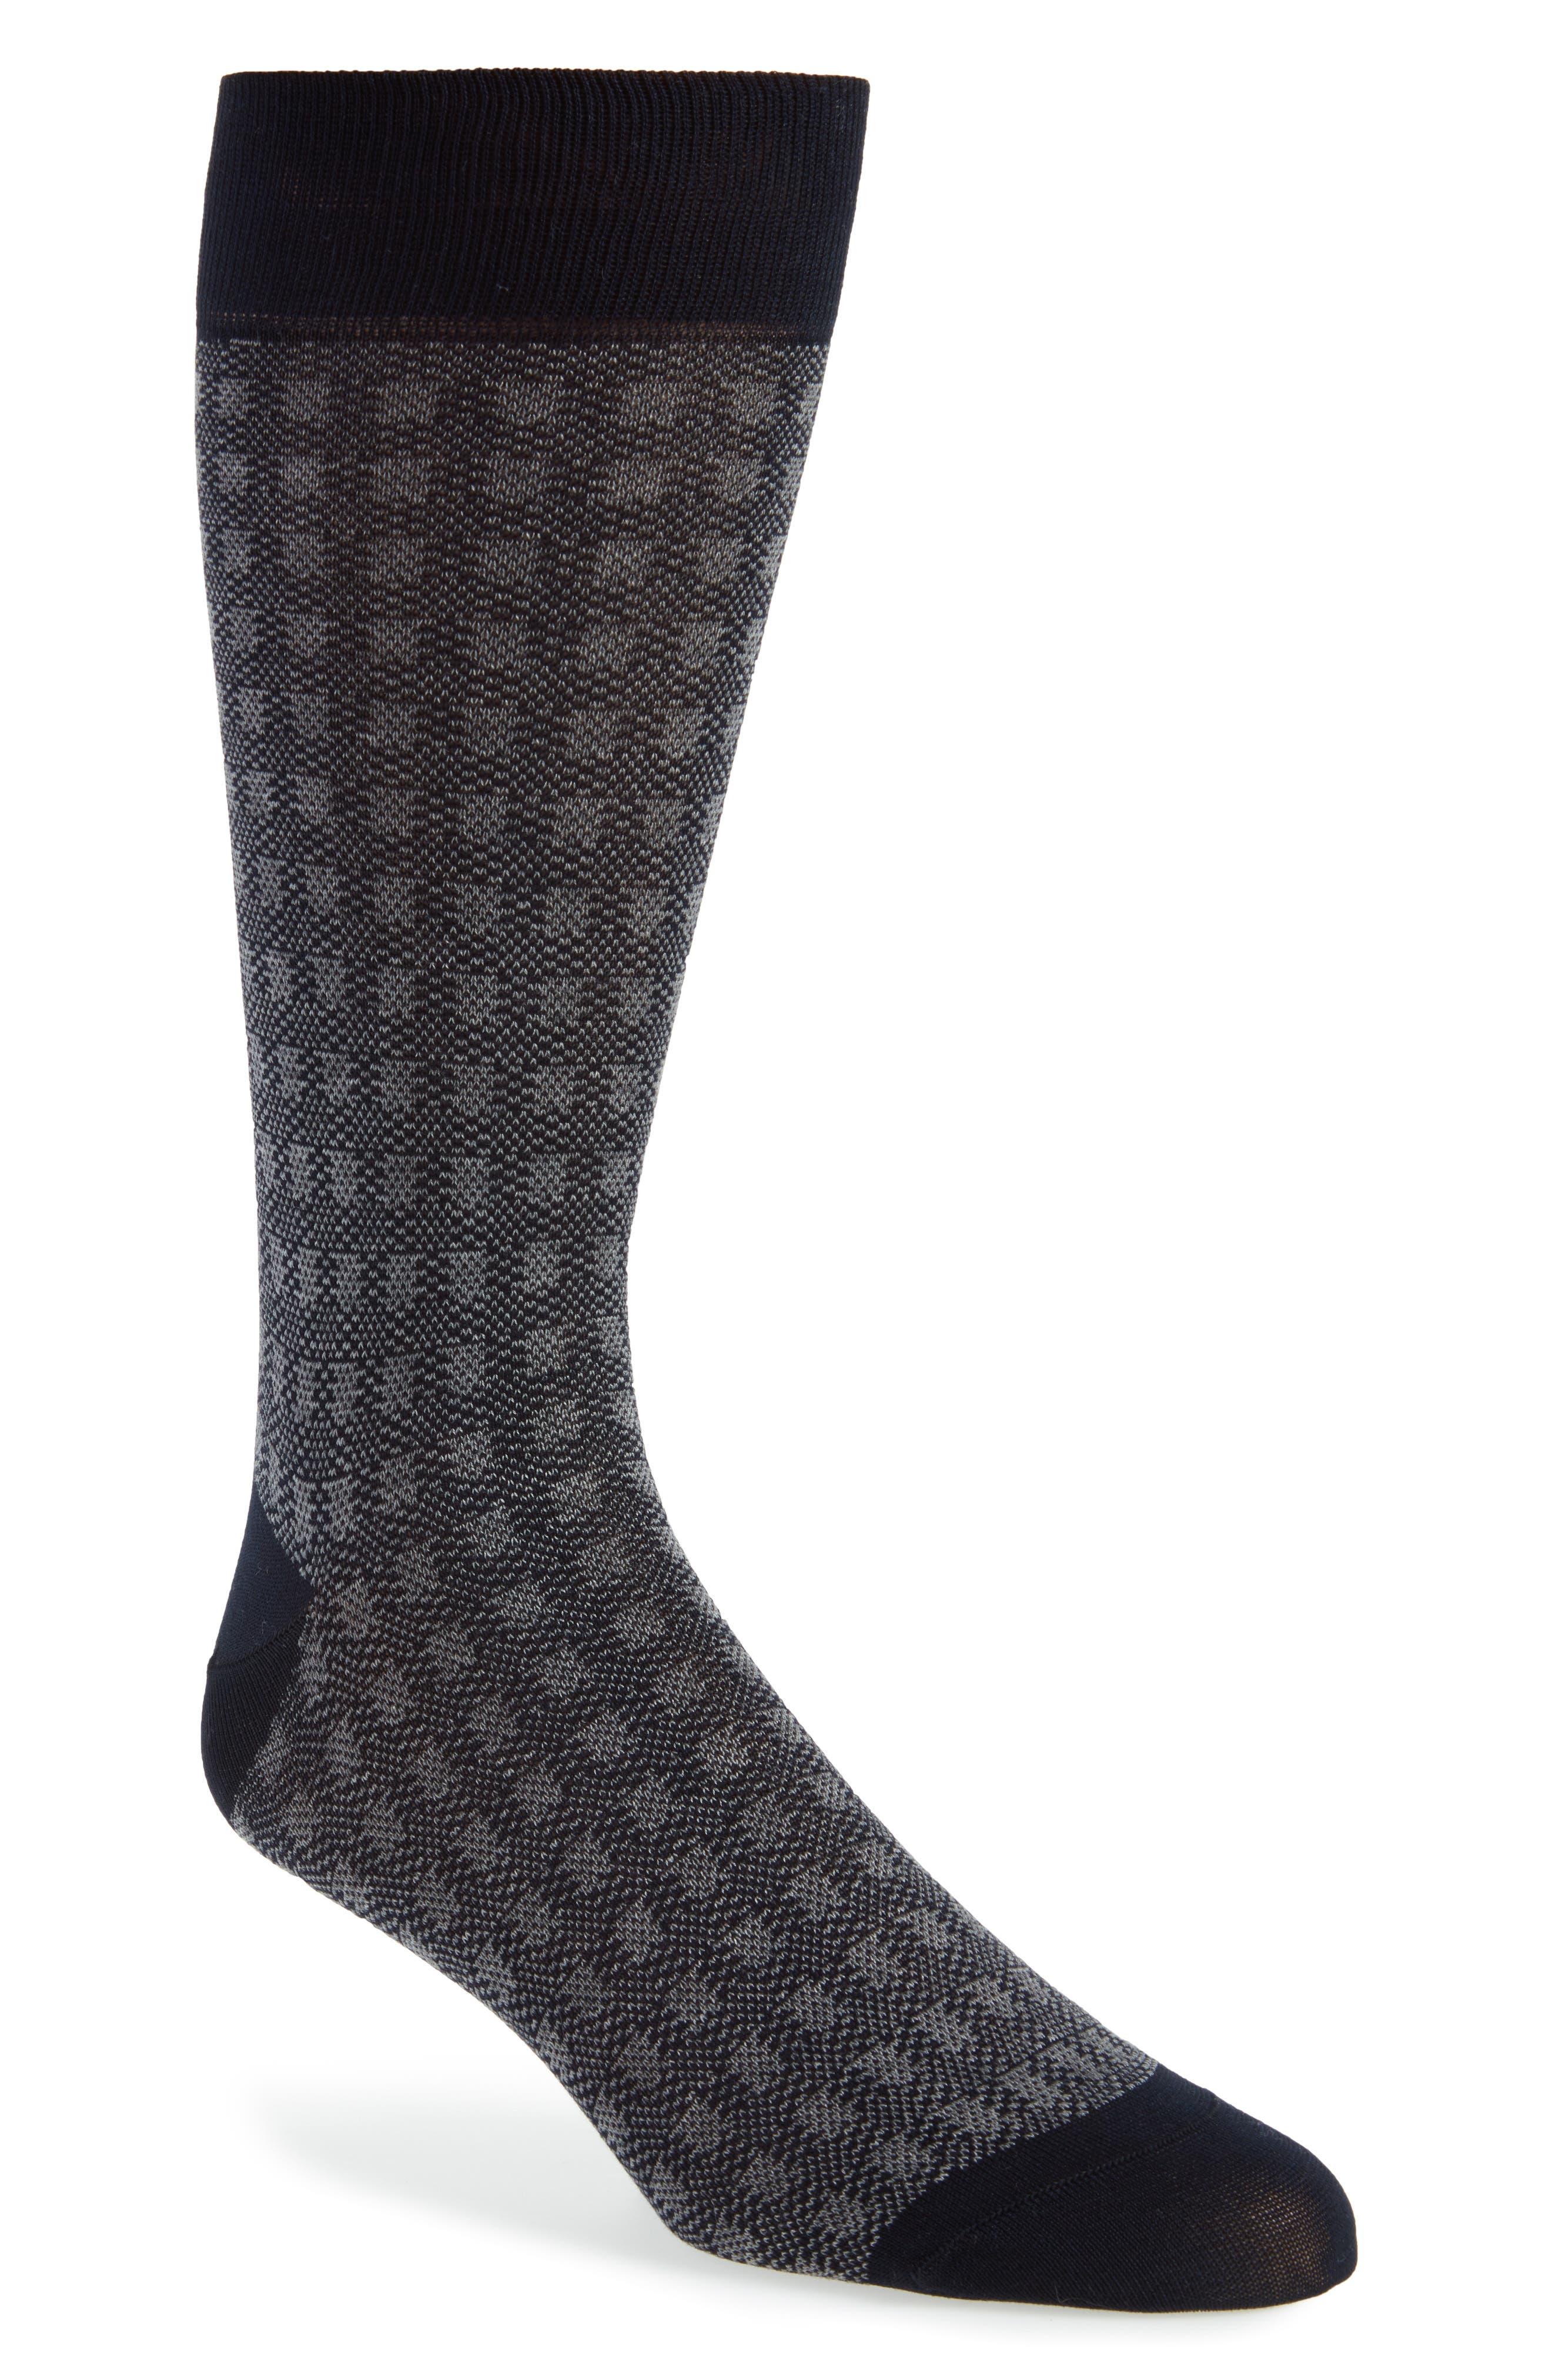 Pantherella Birdseye Crew Socks